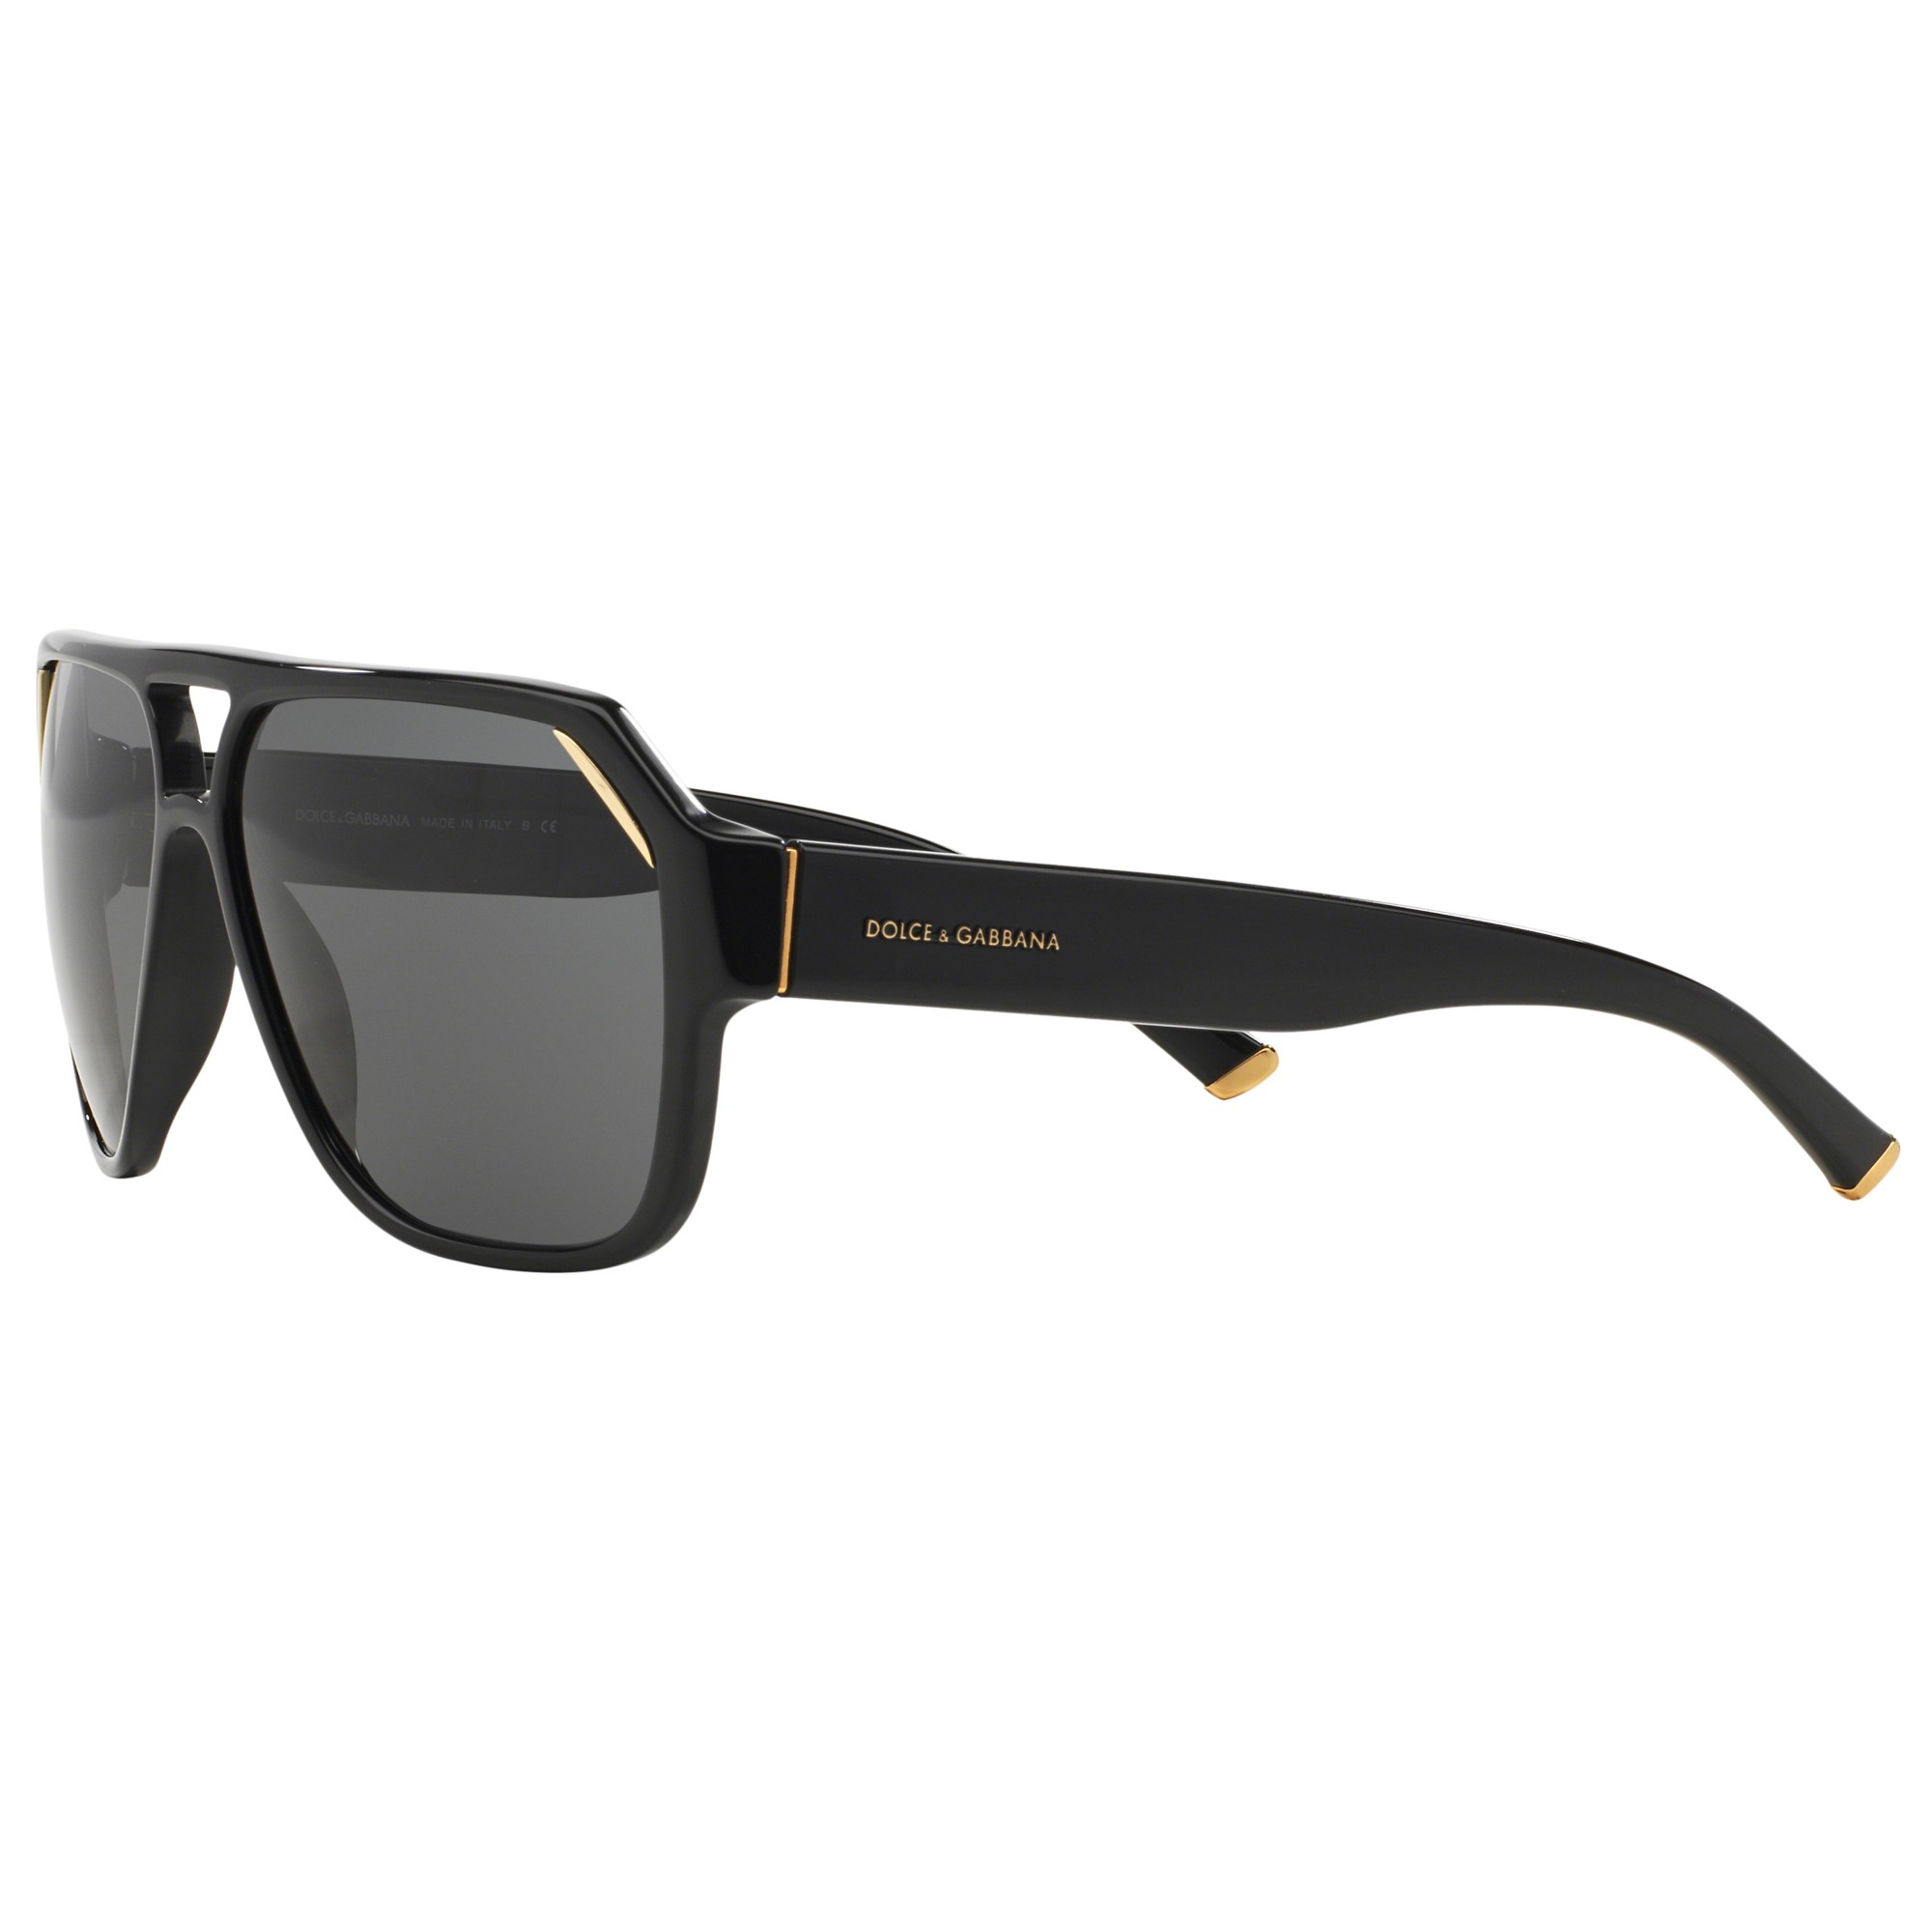 6d96c7d3f5 Dolce   gabbana Dolce And Gabbana Dg4138 Geometric Sunglasses in Black